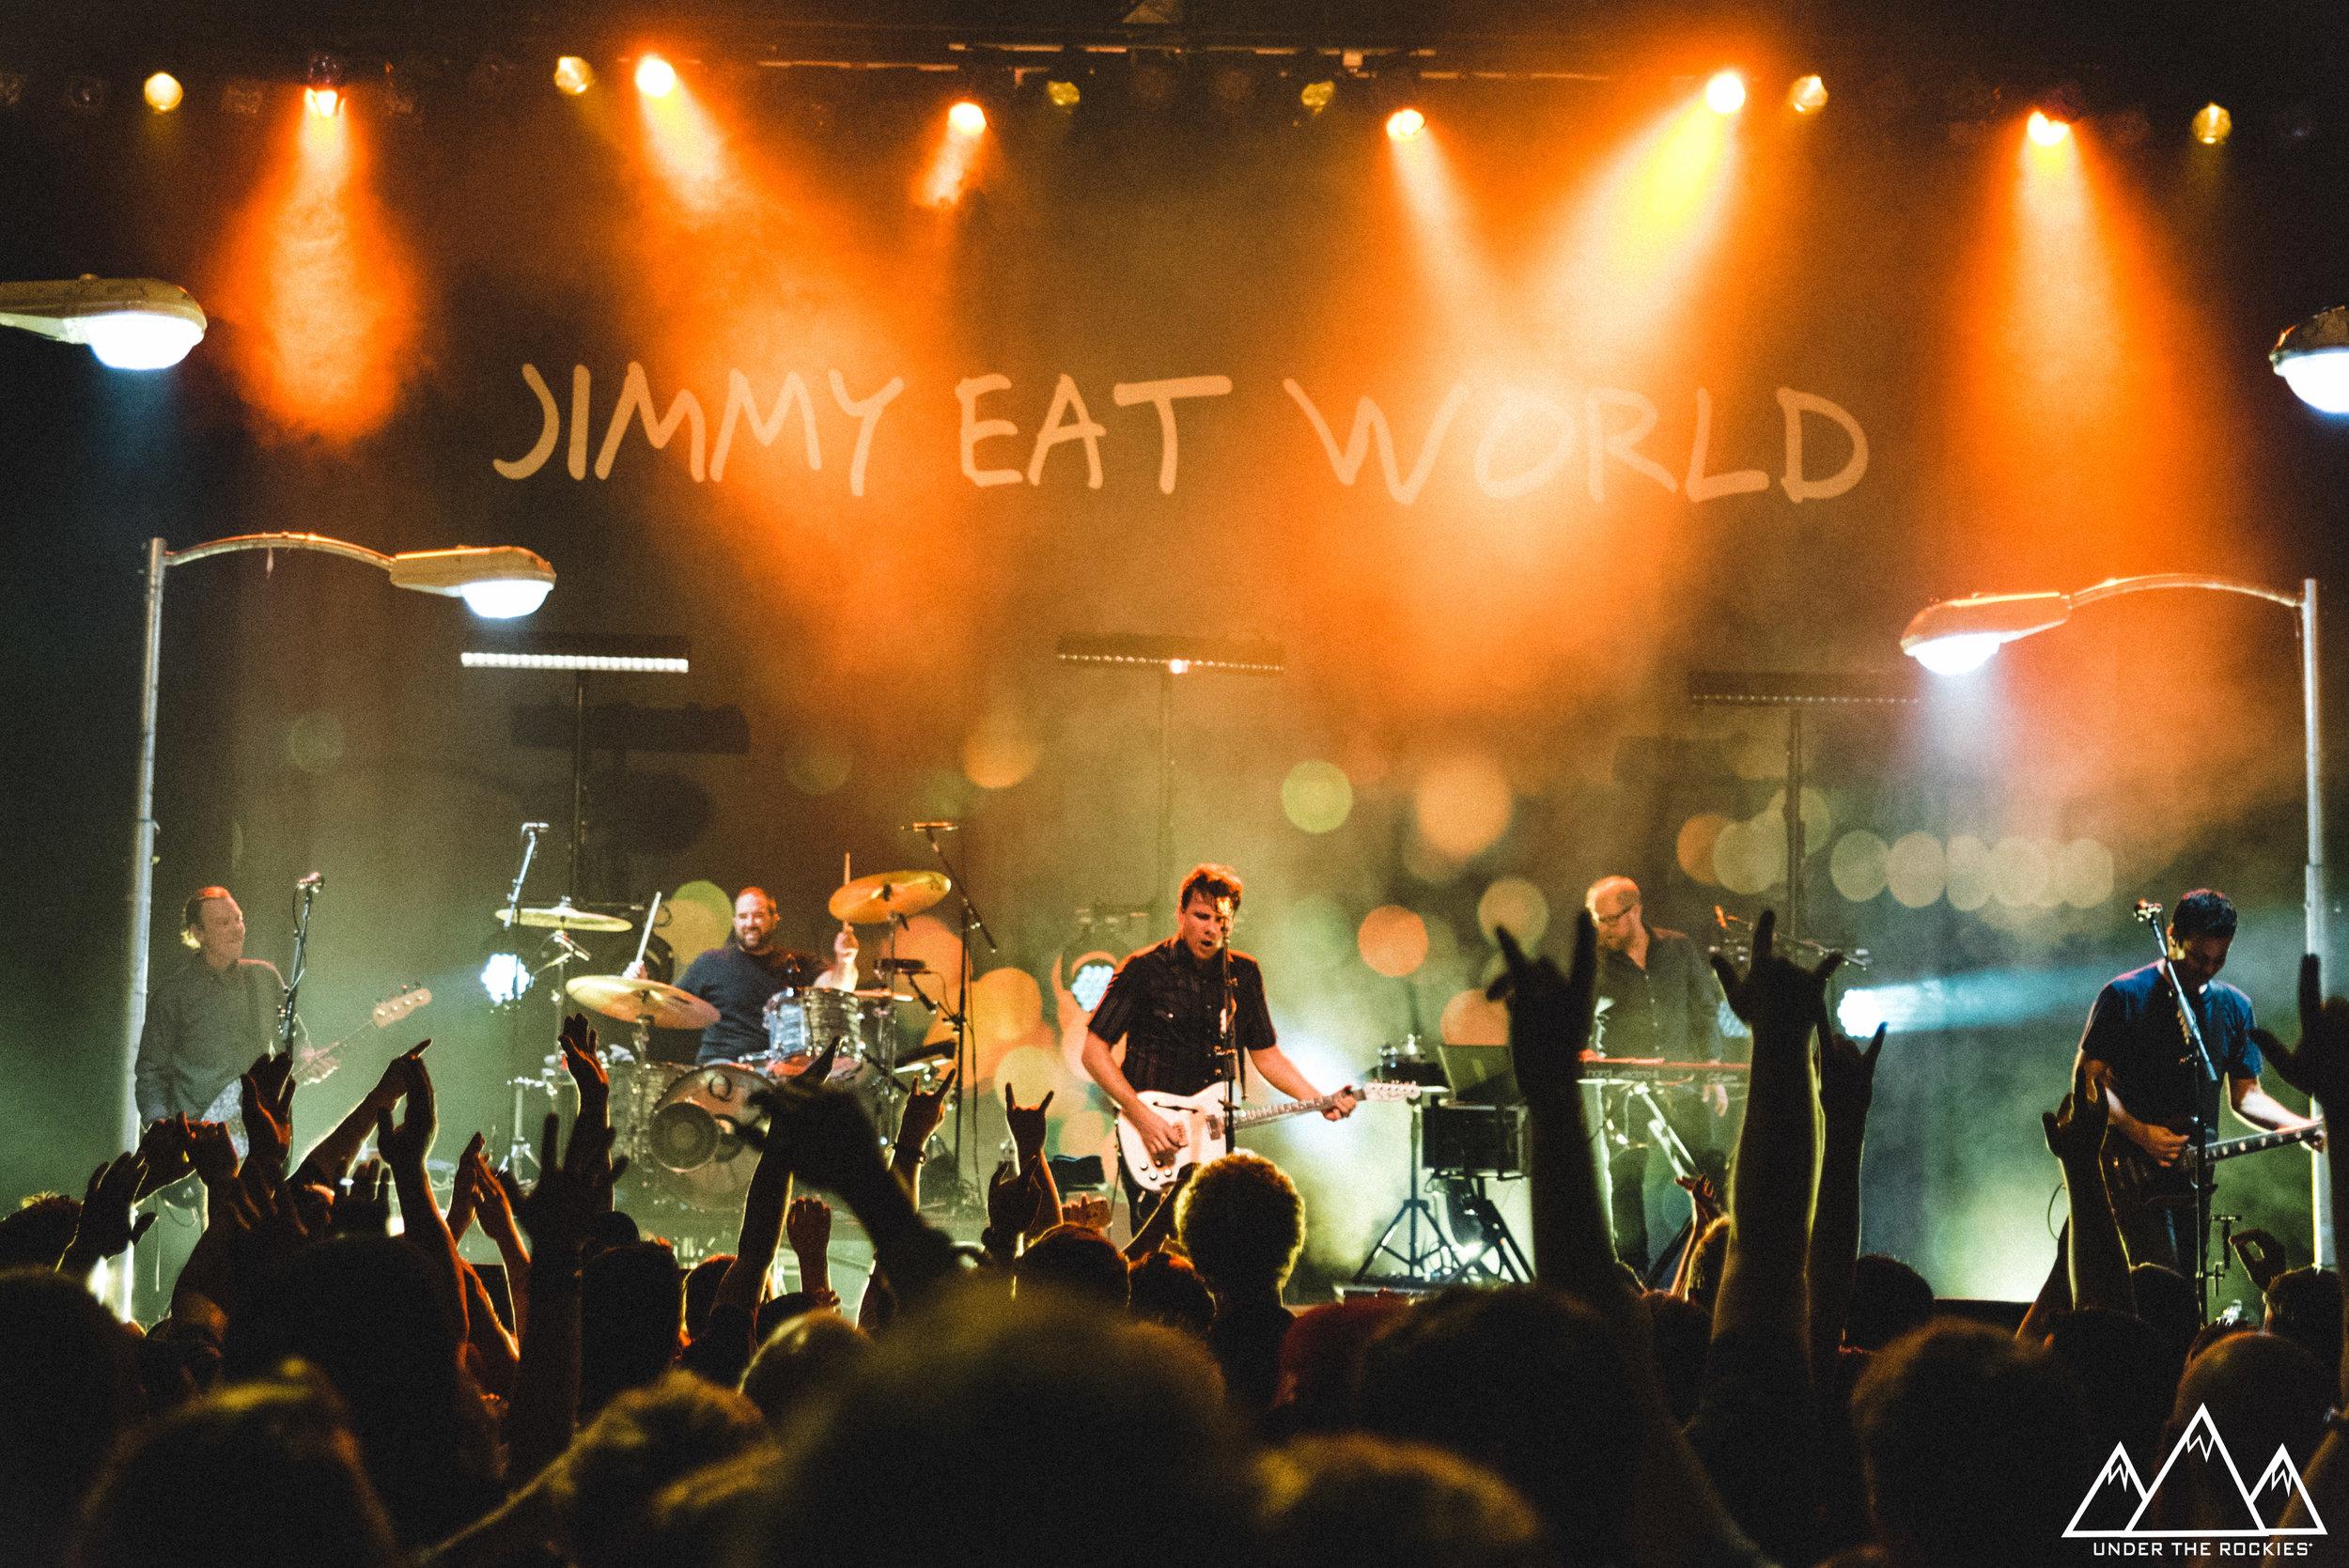 JimmyEatWorld-2.jpg